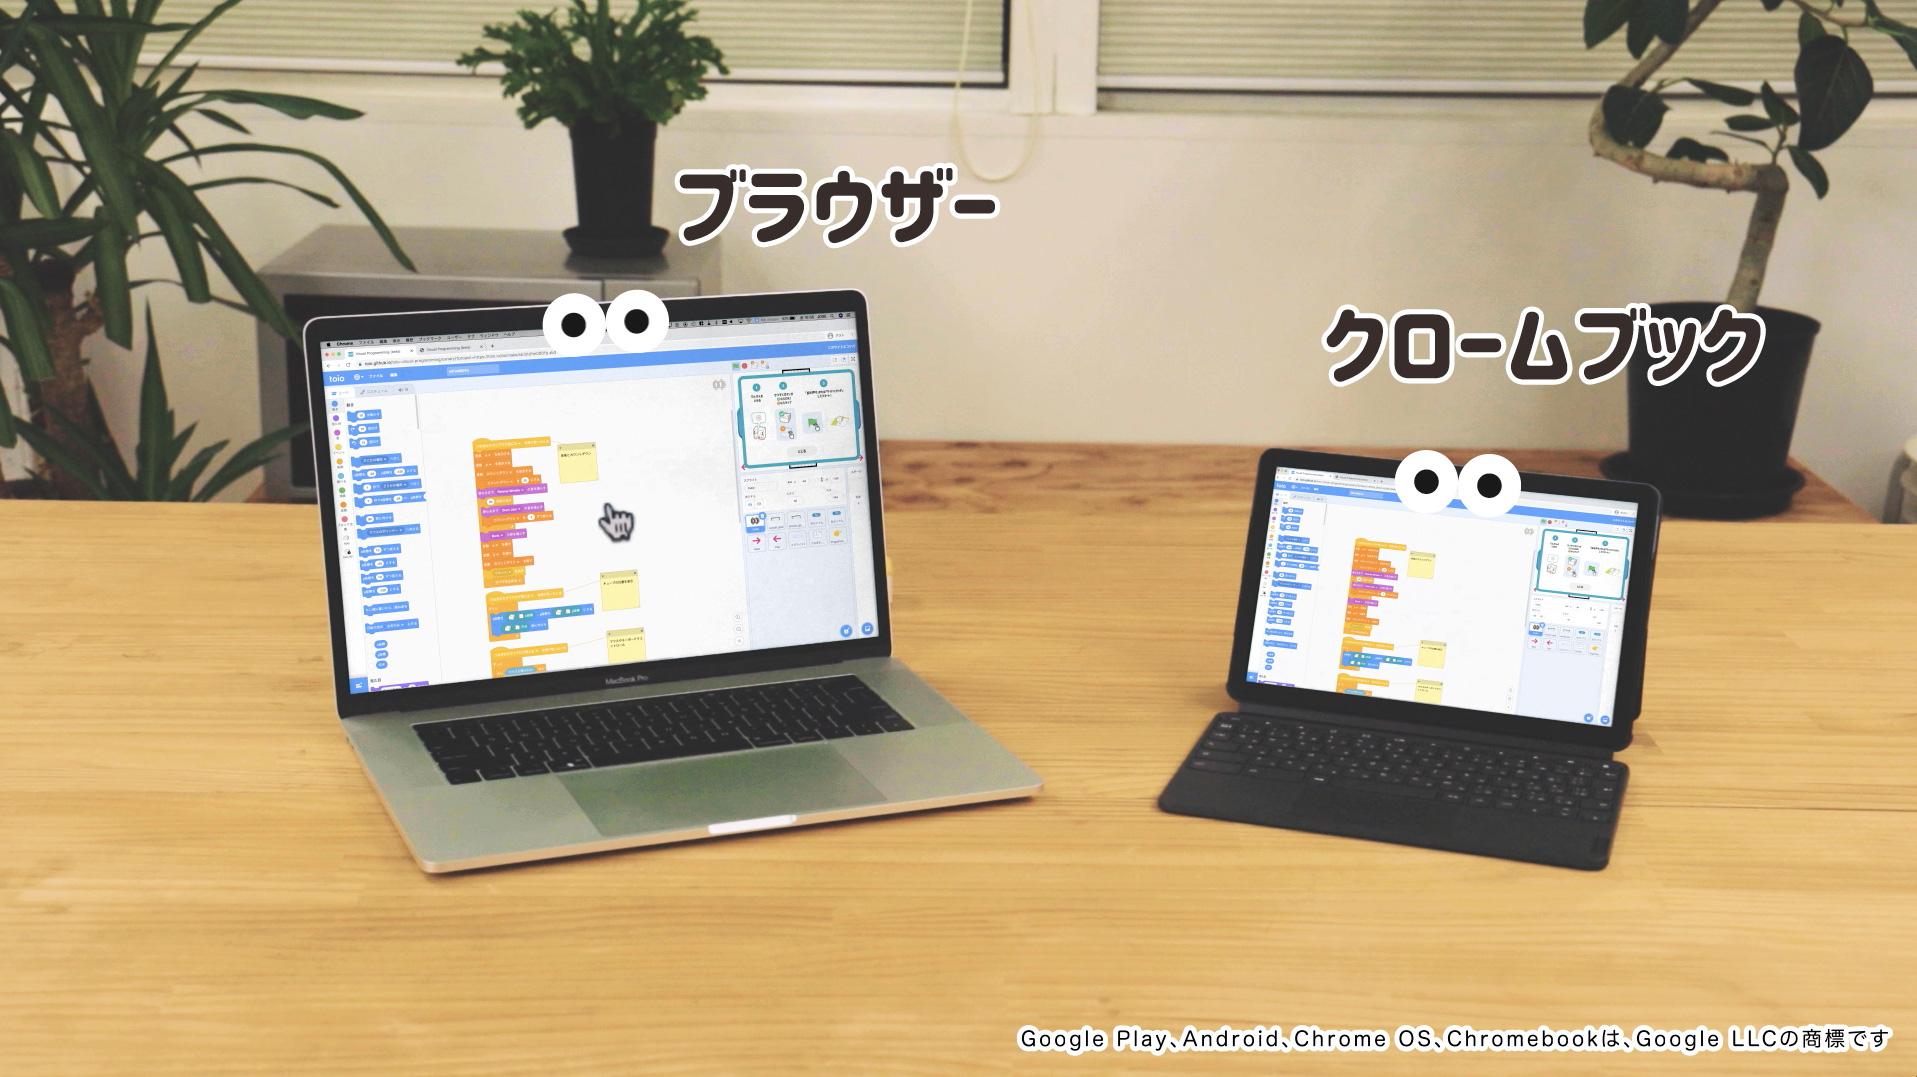 toio_Do_chromebook.jpg